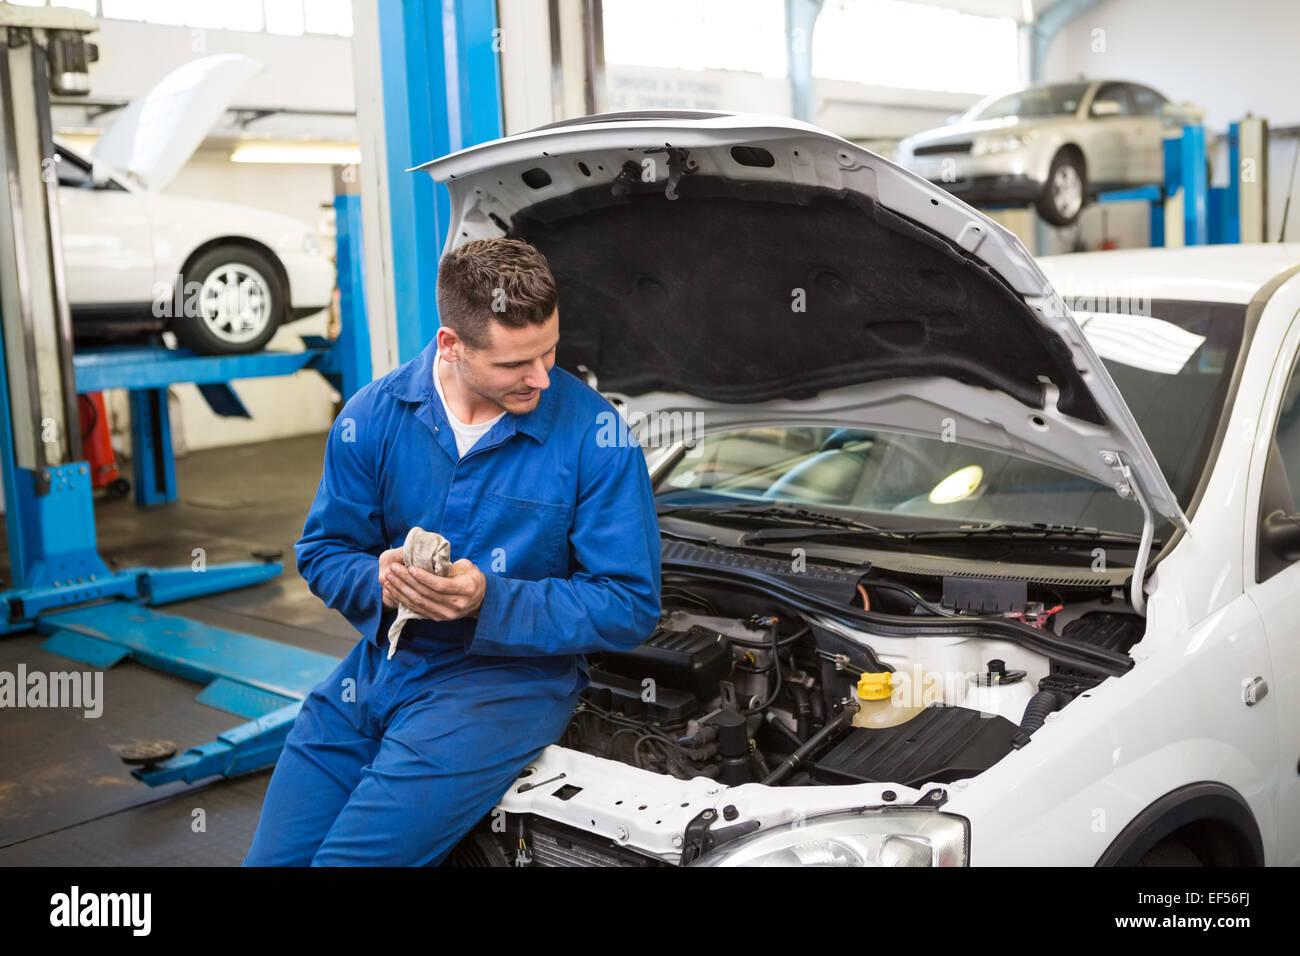 Mecánico sonriendo mirando coche Imagen De Stock